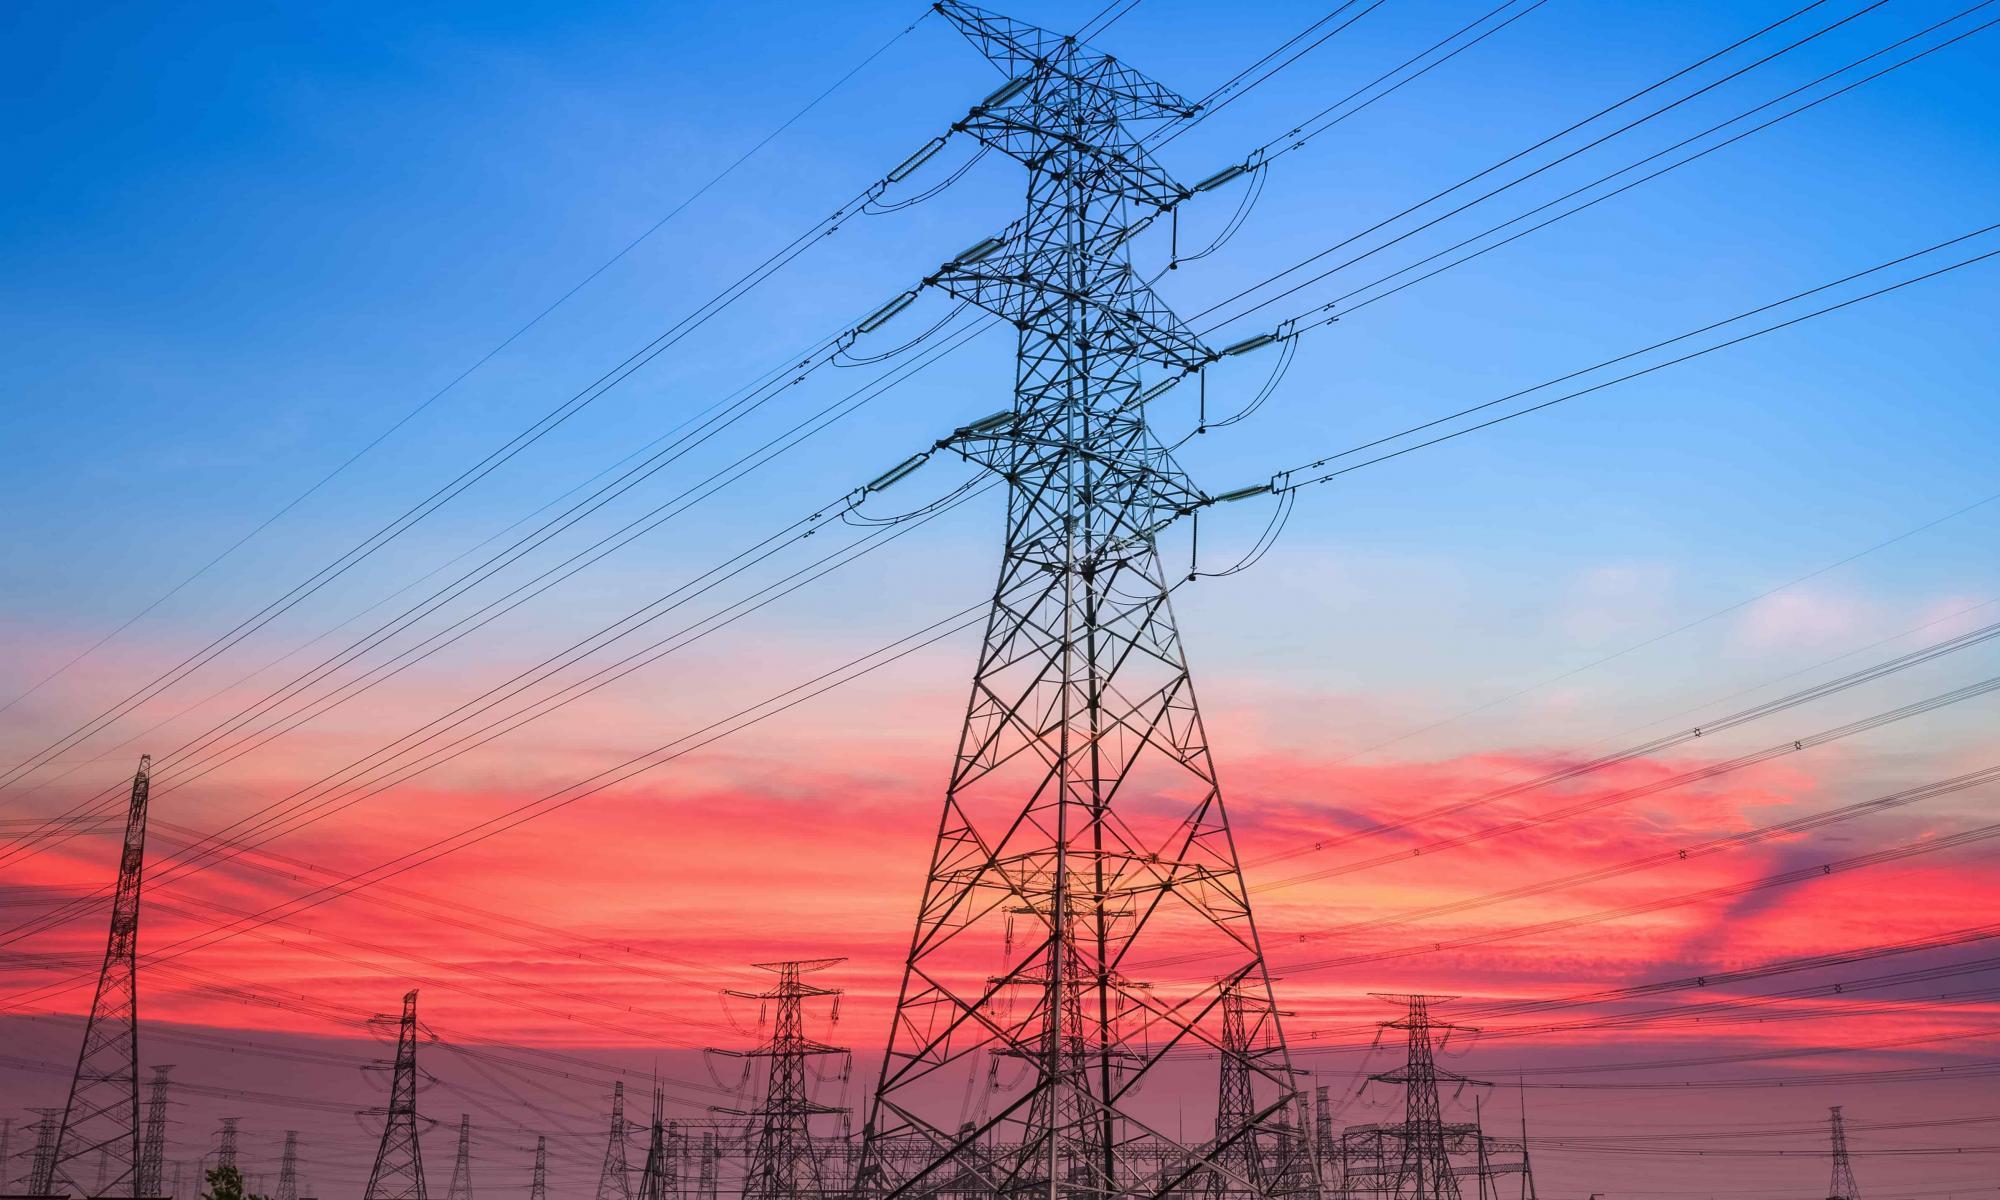 electricity-pylon-in-sunset-min